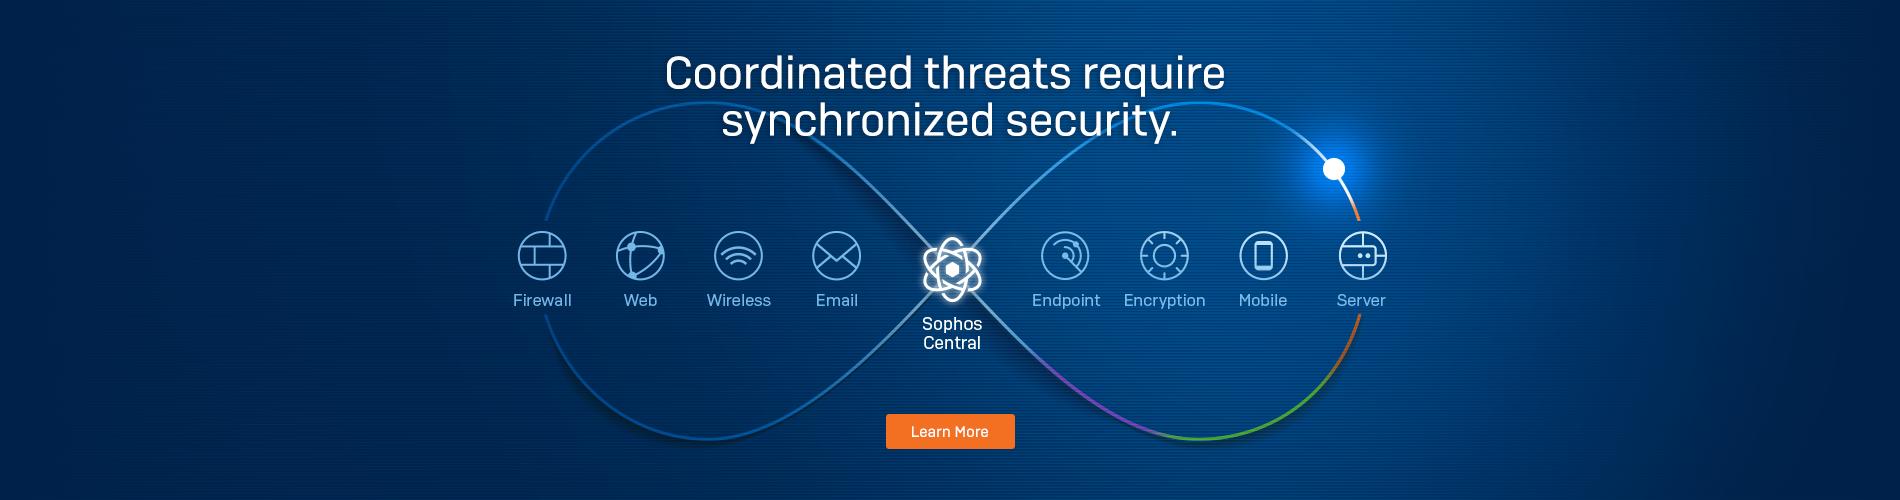 Sophos Synchronized Security